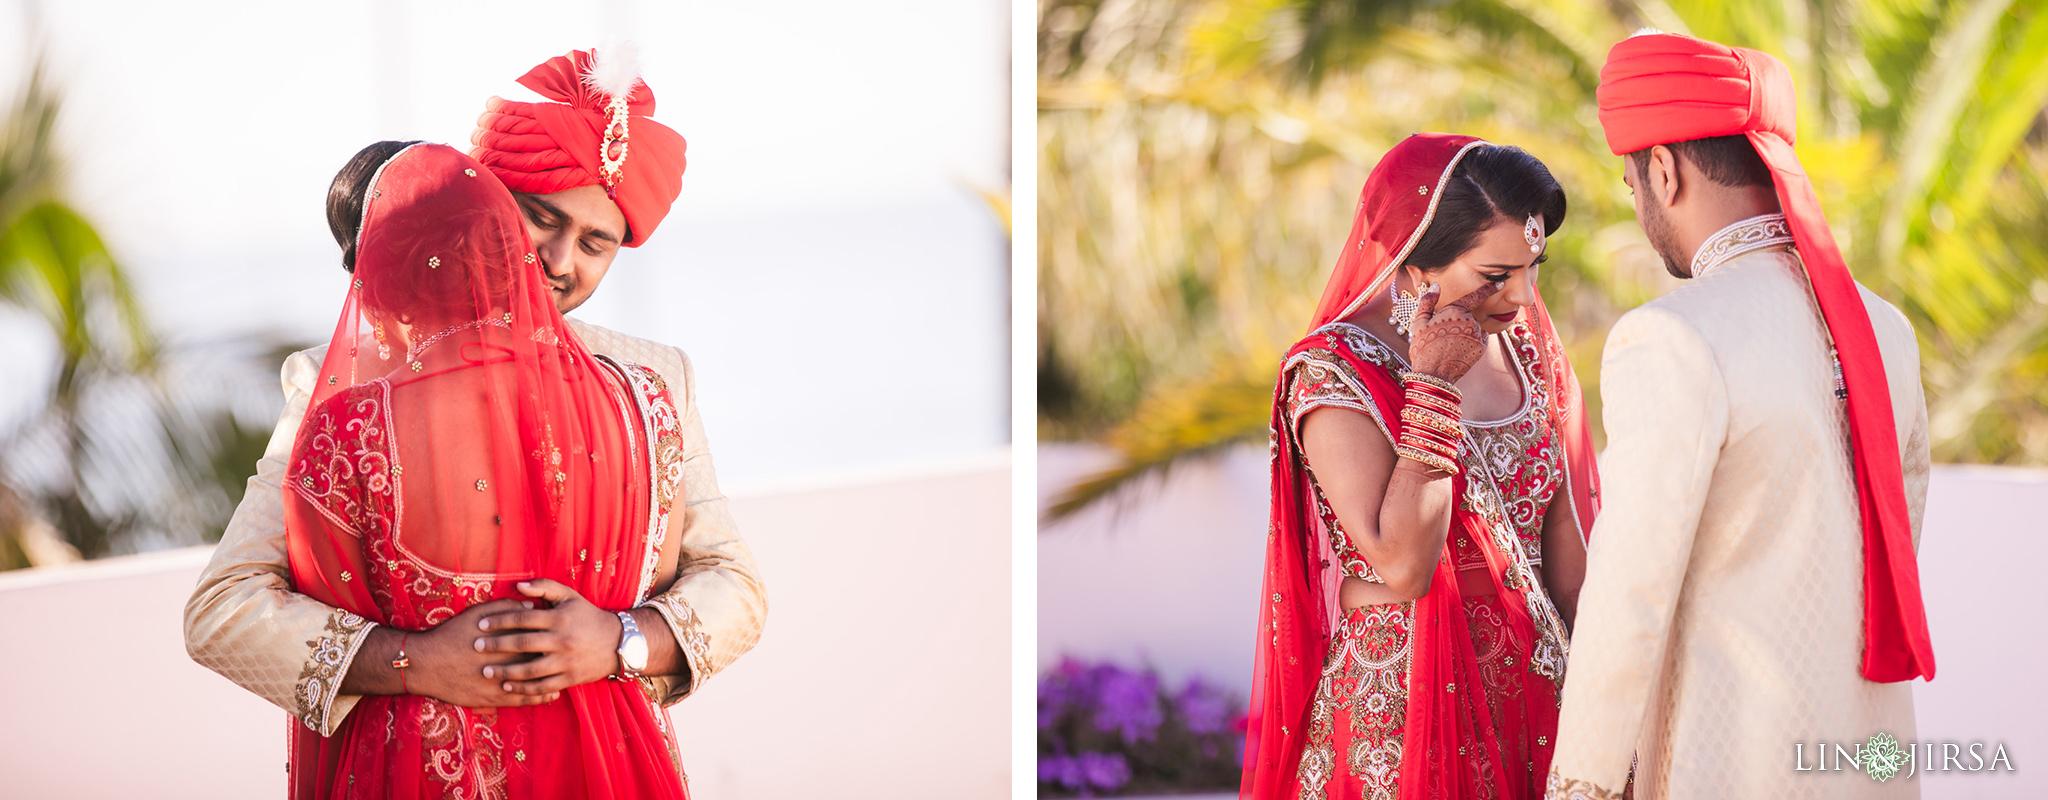 12 Hilton Santa Barbara Indian Wedding Photography